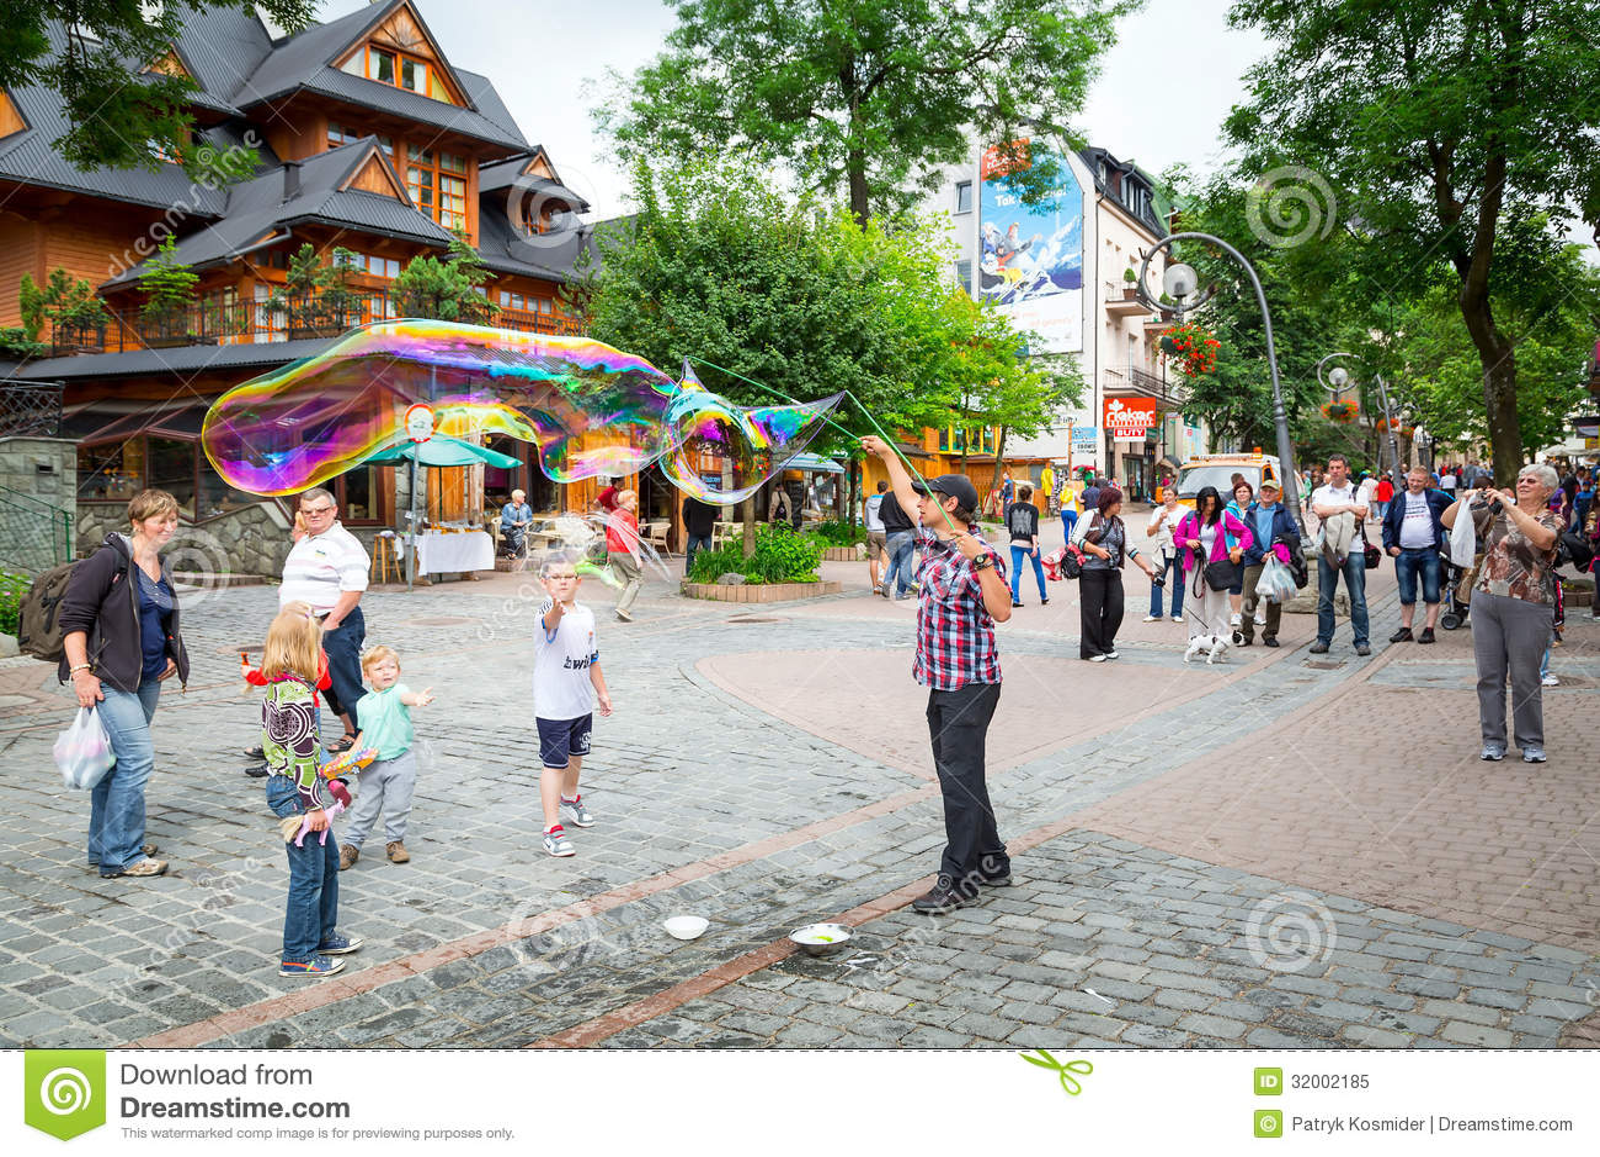 Wales Poland In Zakopane Adult Services